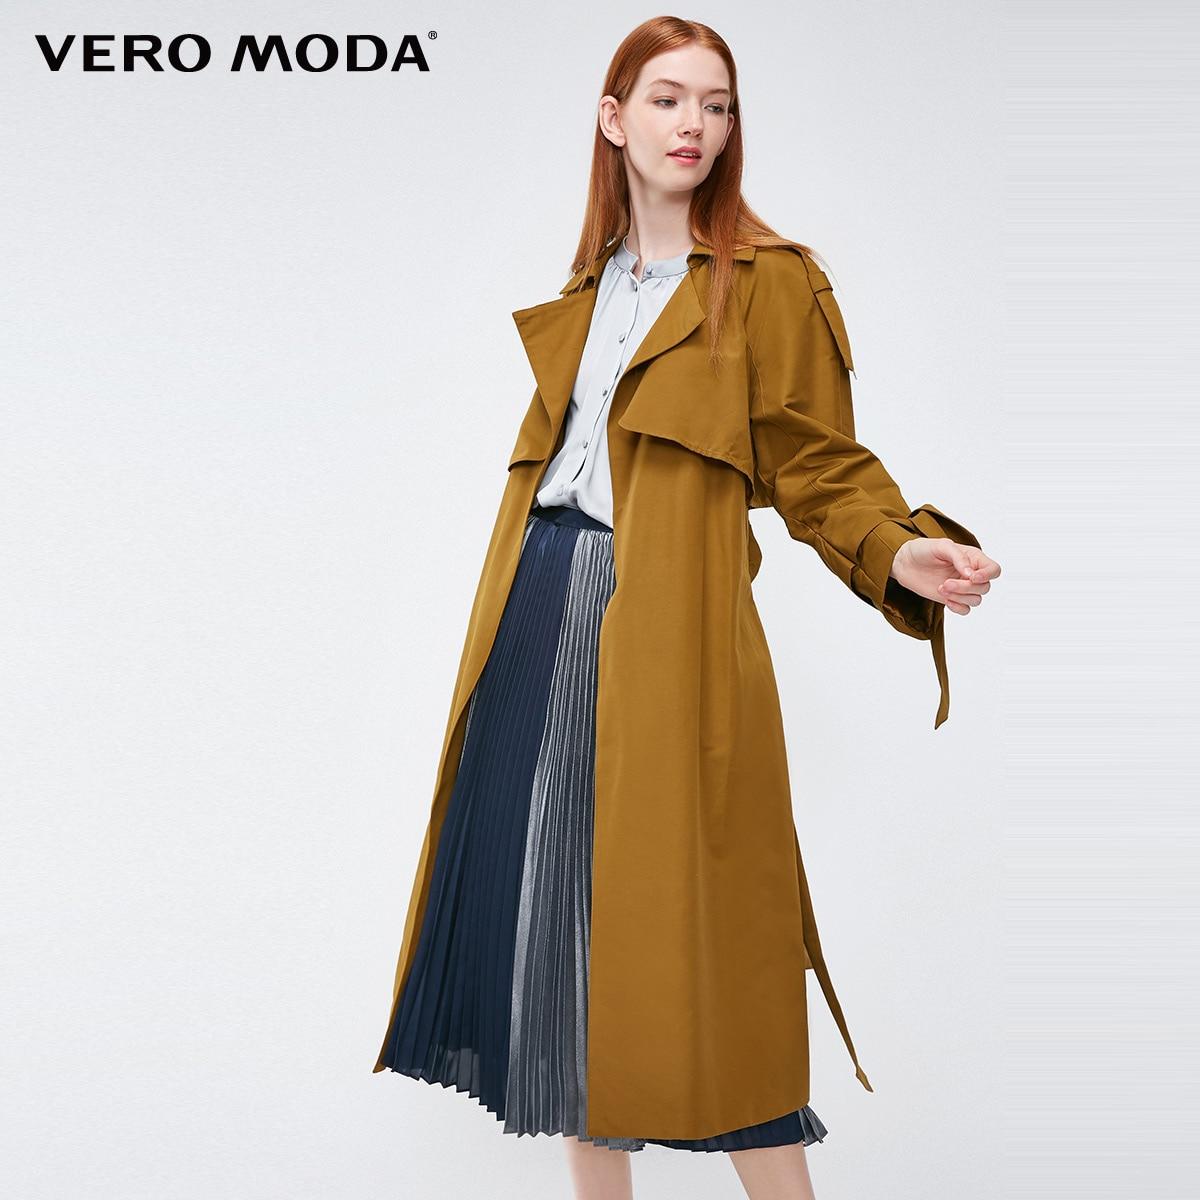 Vero moda 2019 novo pára-brisa design punhos decorados british longo trench coat | 318321508